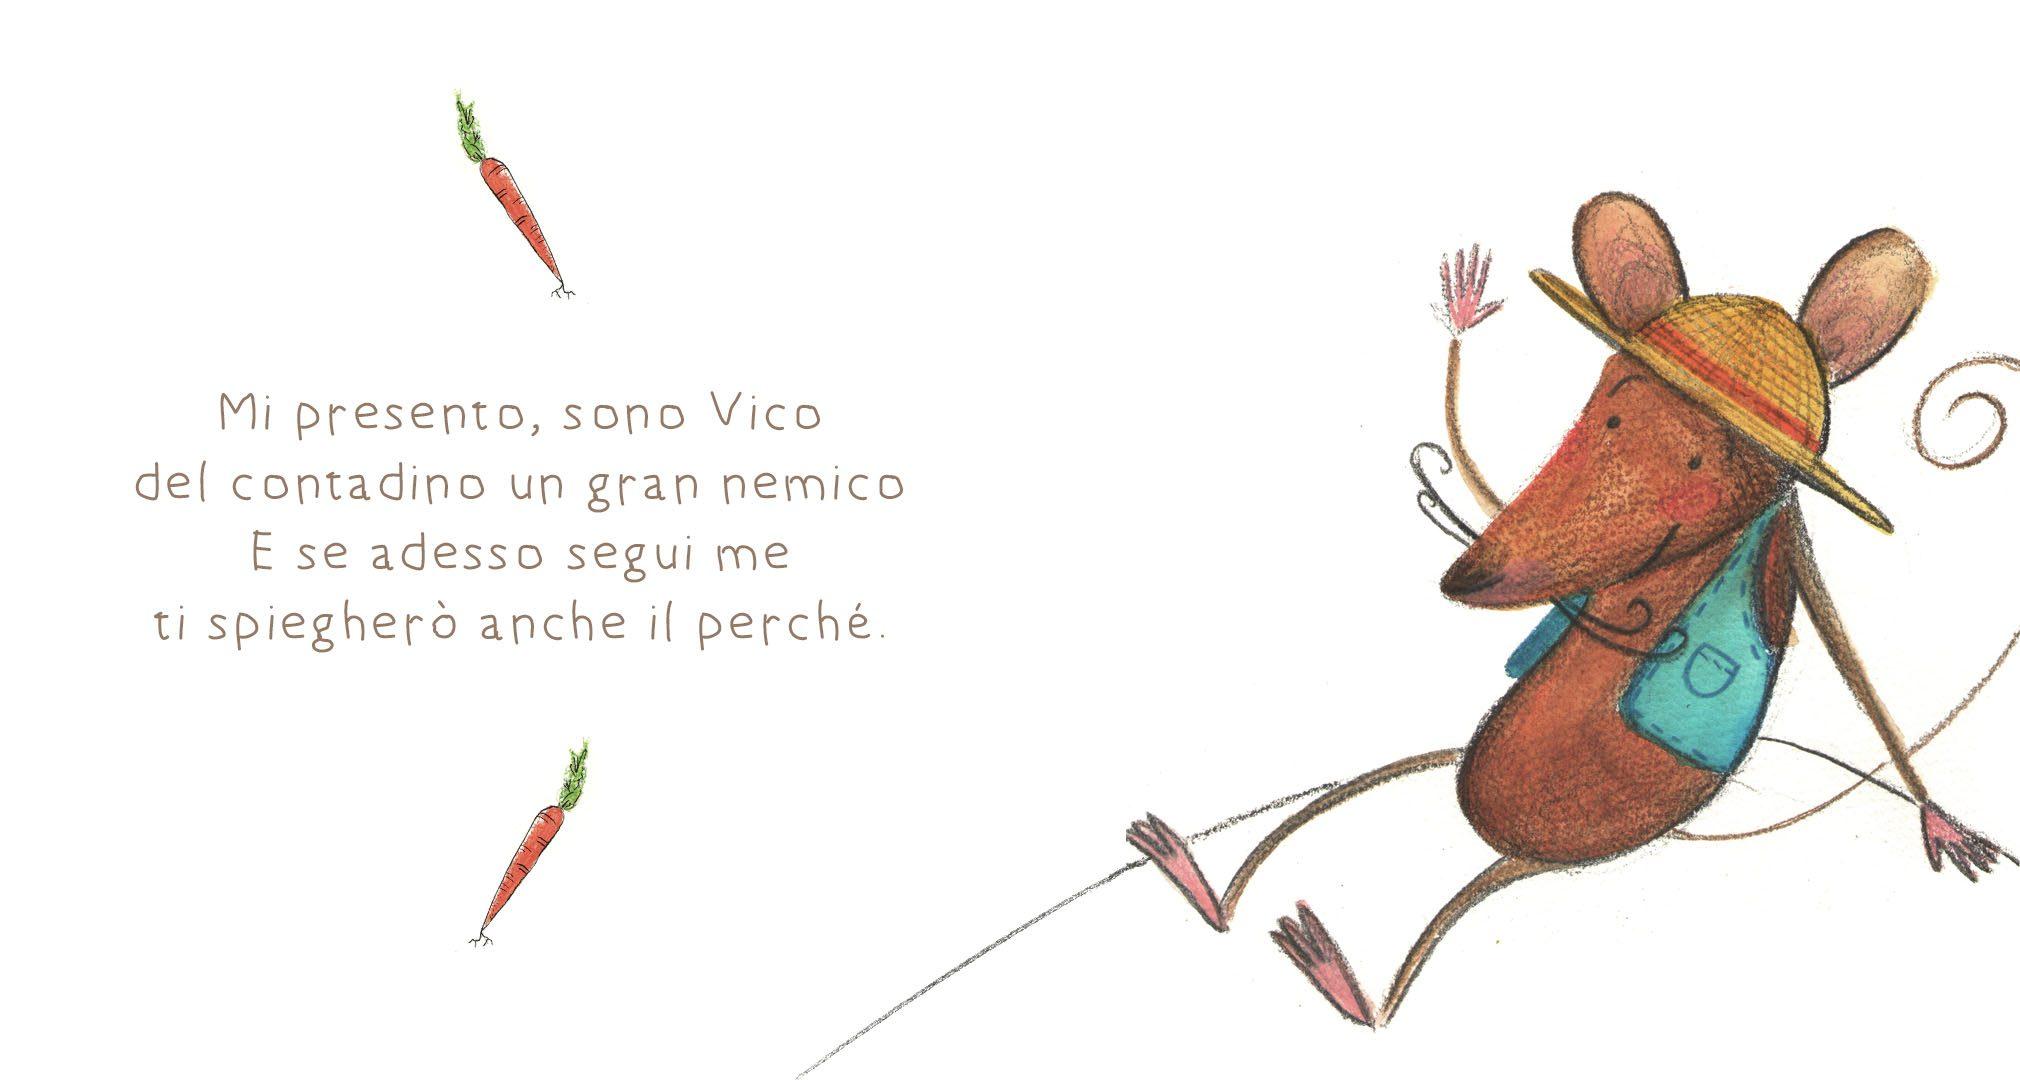 Vico1